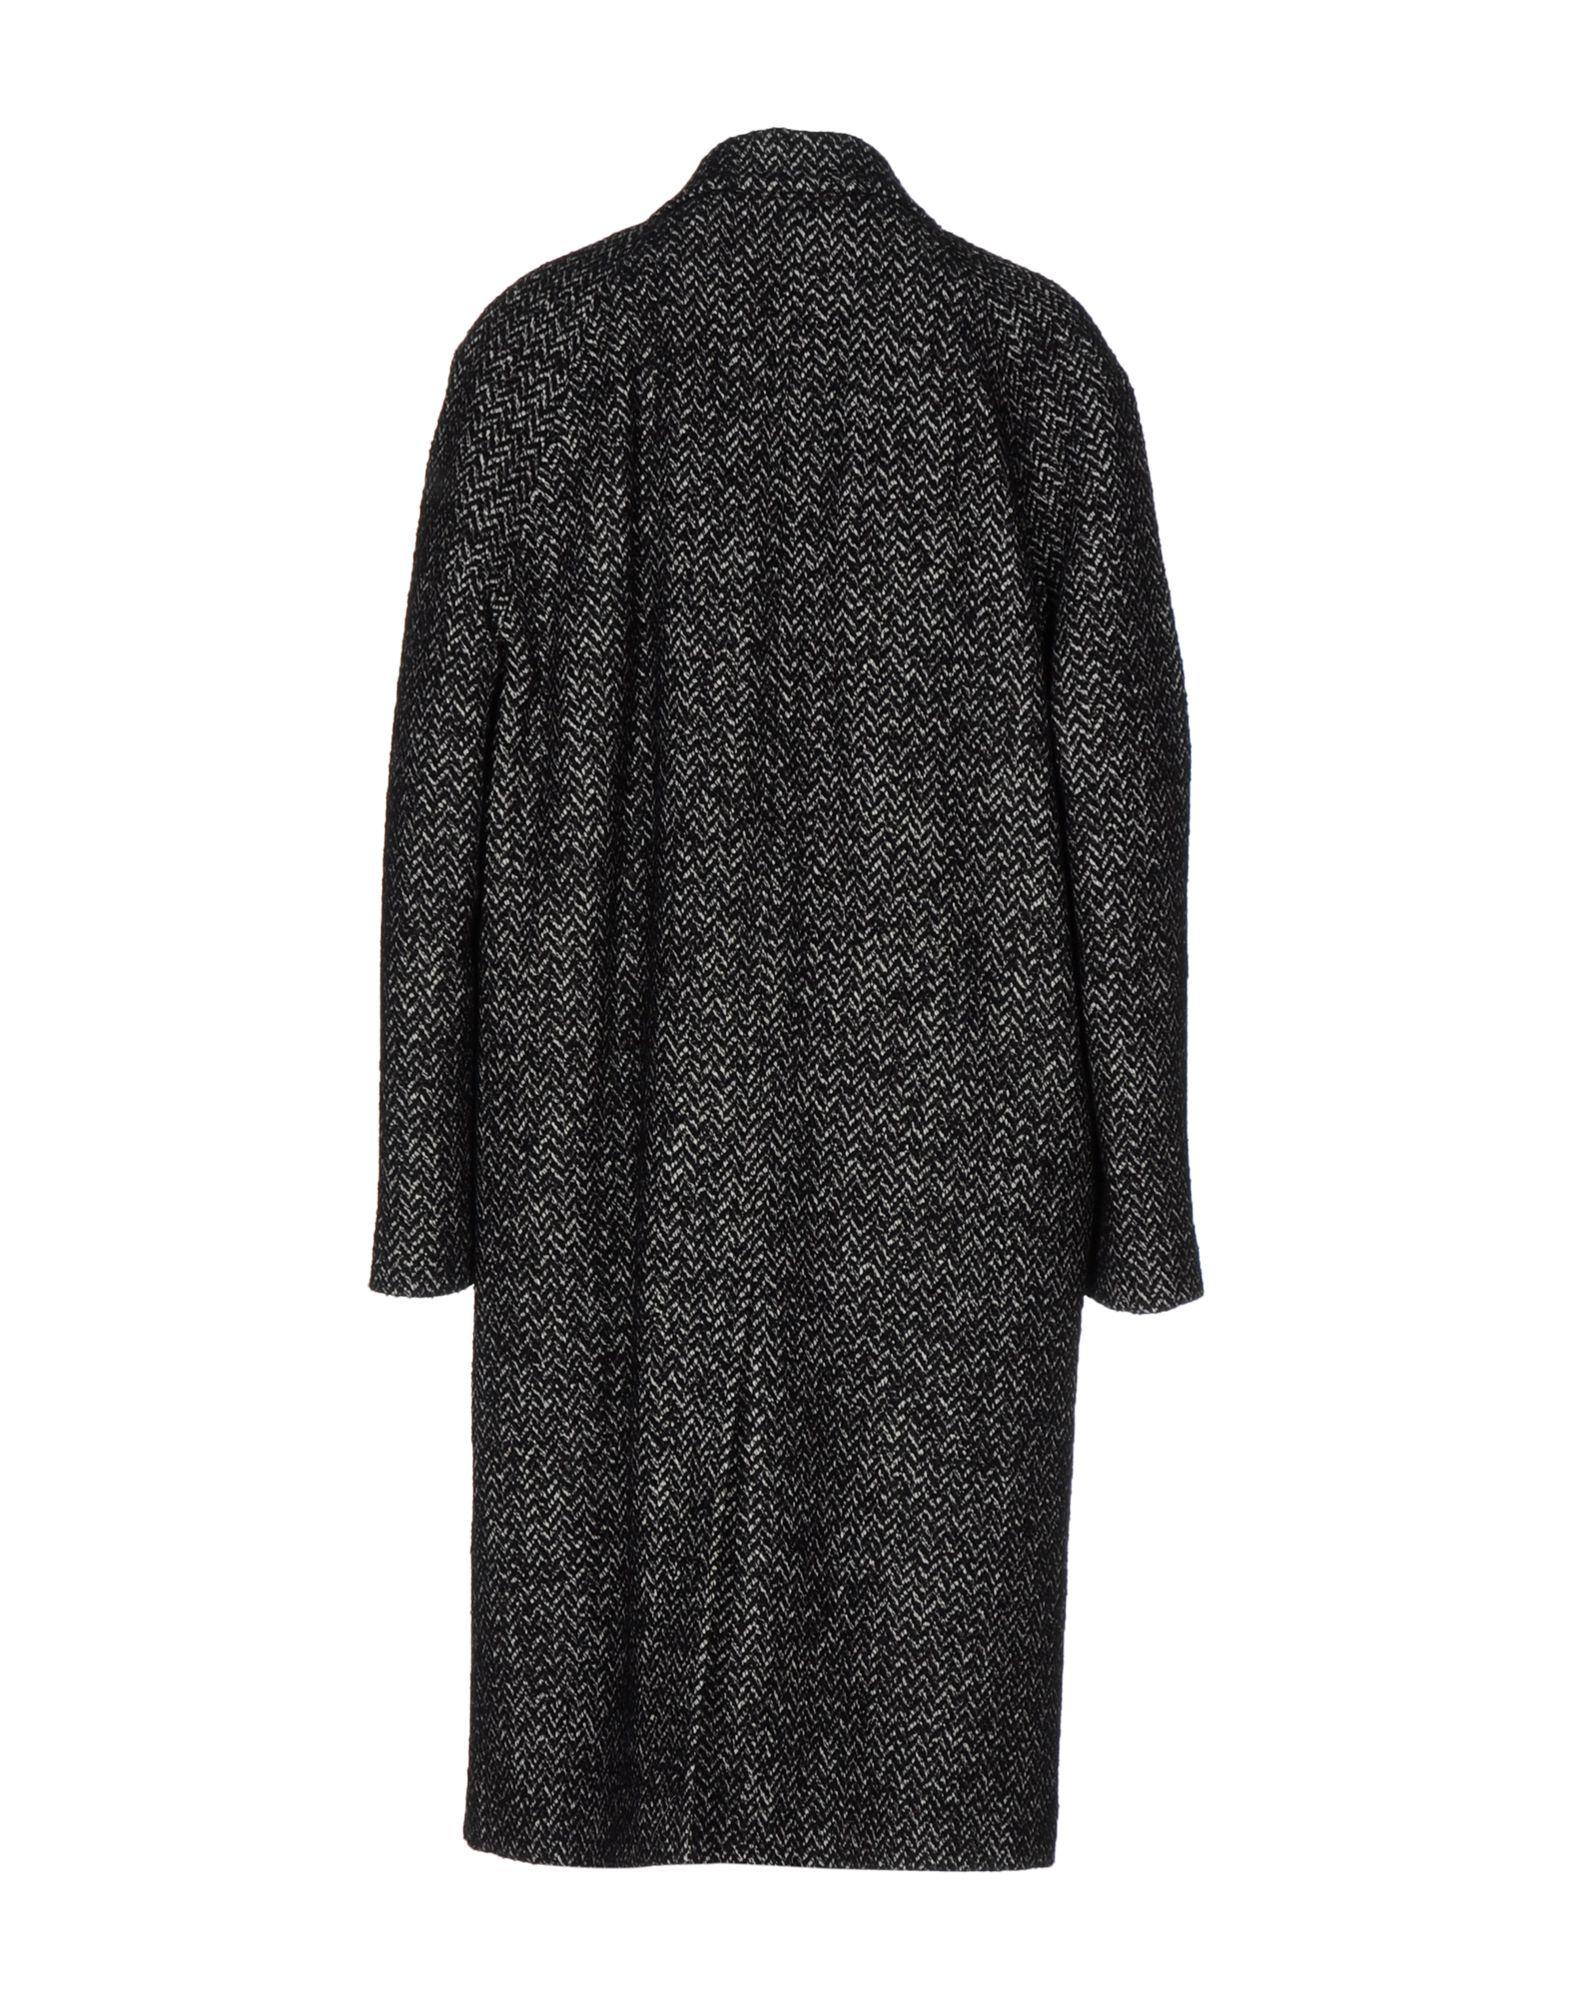 Dolce & Gabbana Black Virgin Wool Boucle Overcoat